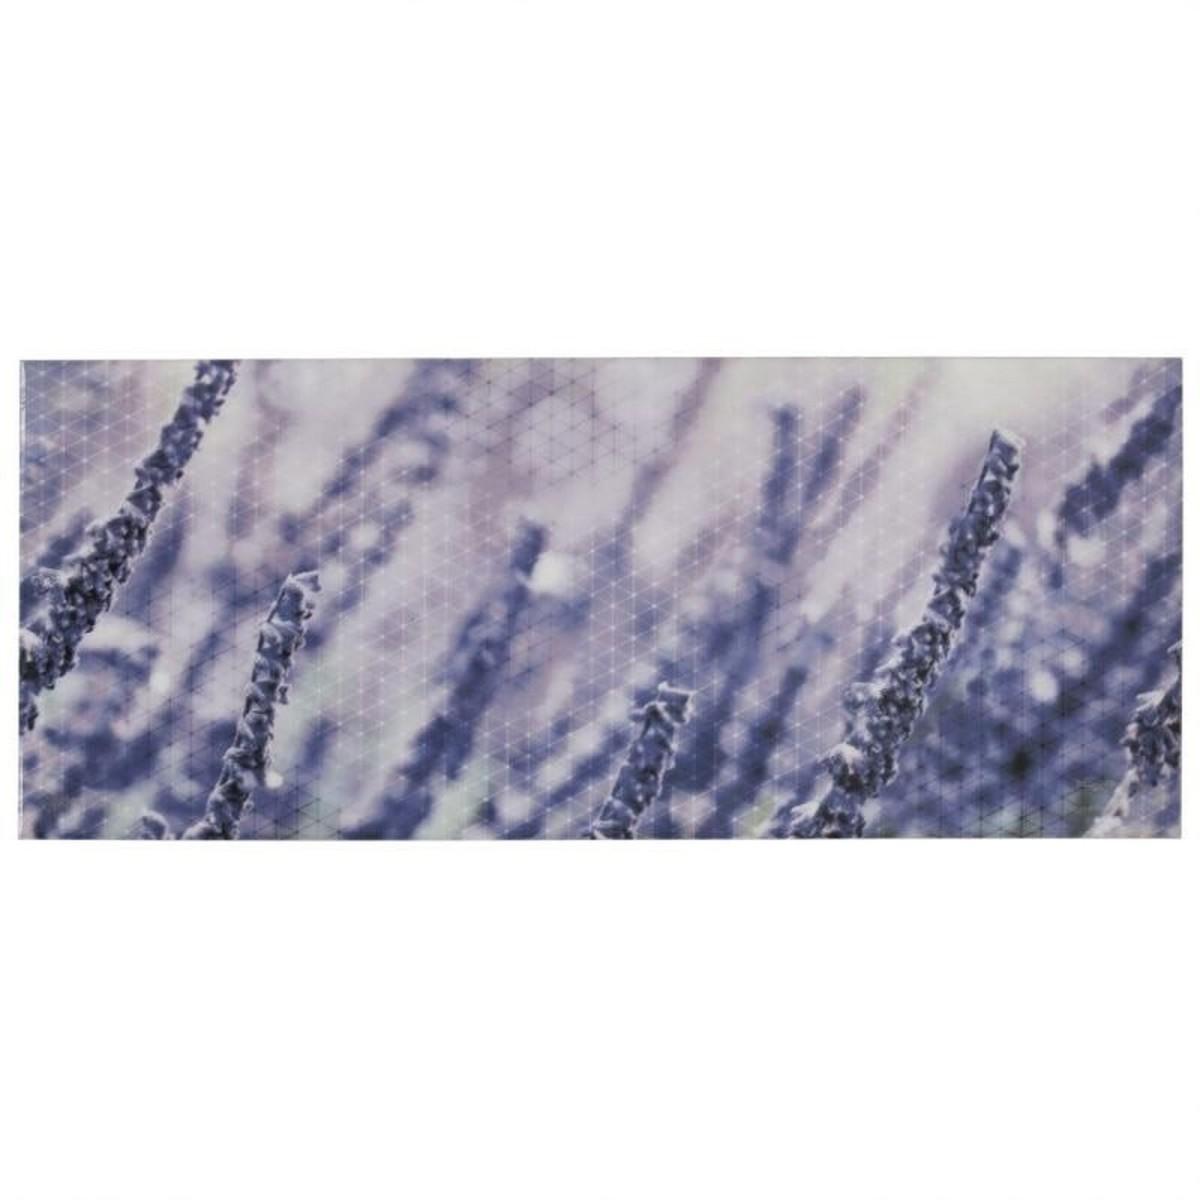 Панно Концепт тип 2 50х20 см лаванда цвет фиолетовый